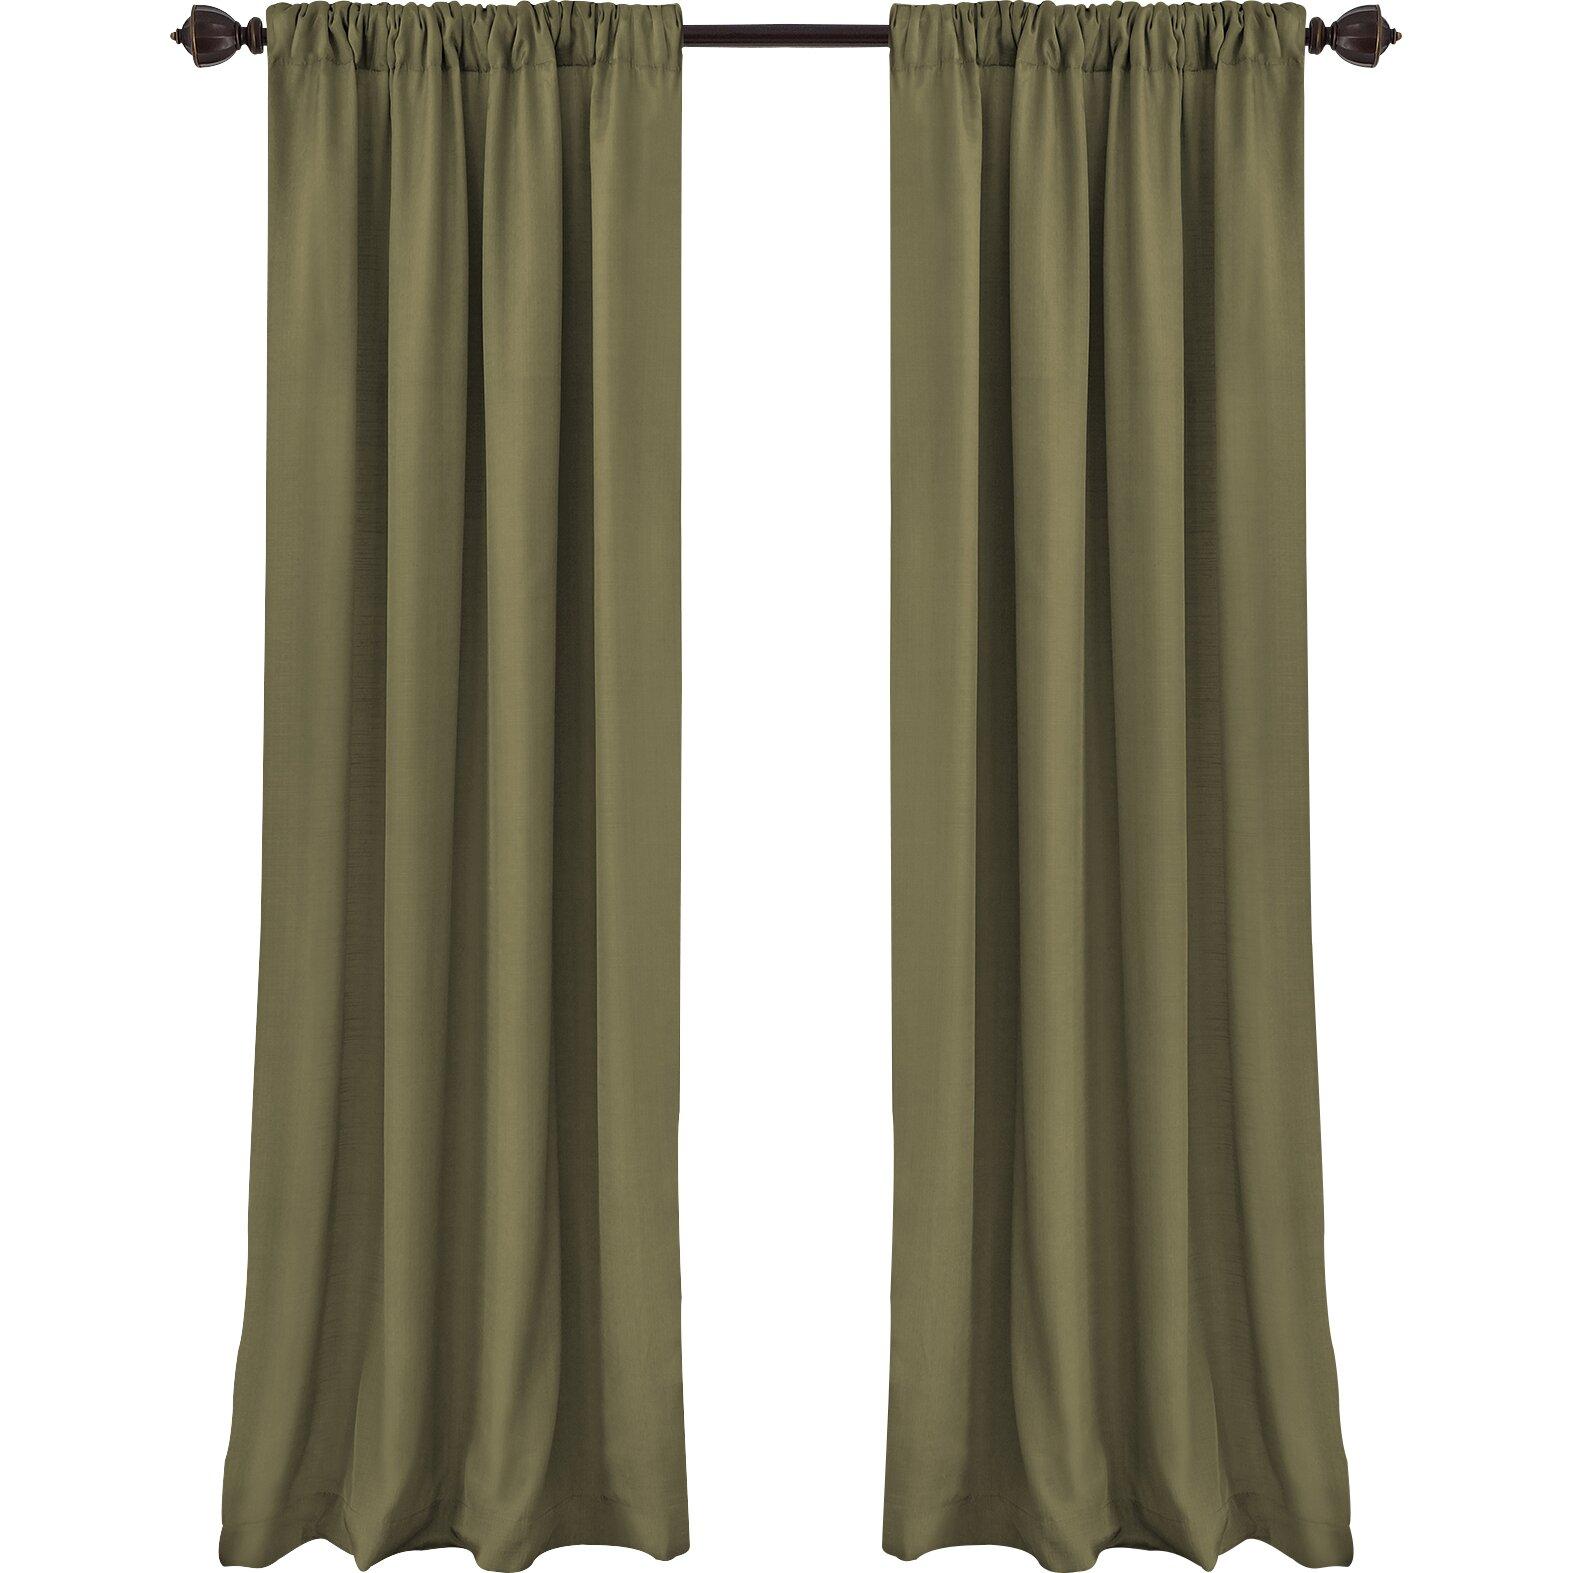 Astoria Grand Morane Cachet Solid Blackout Single Curtain